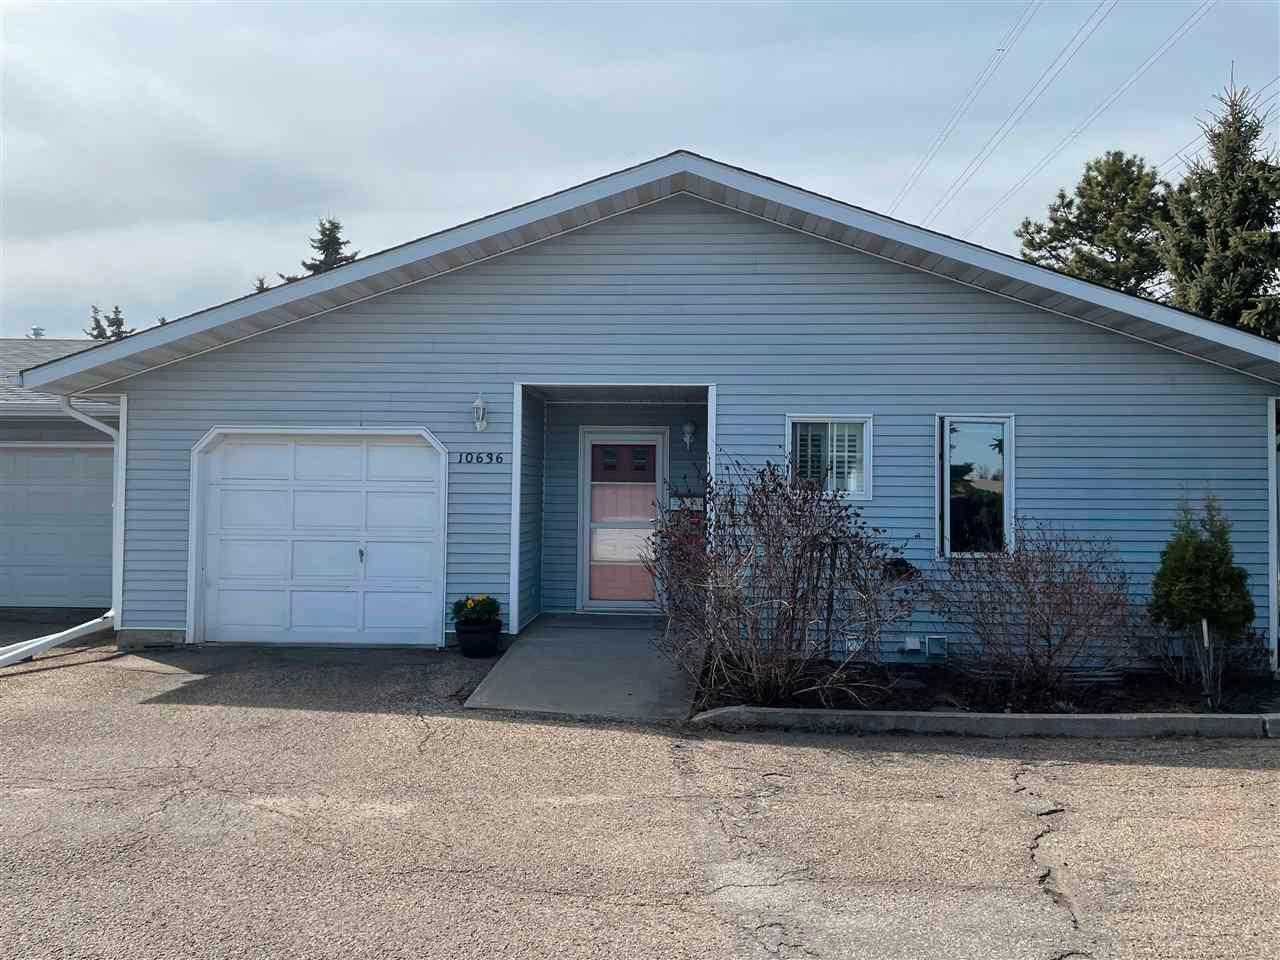 Main Photo: 10636 29 Avenue in Edmonton: Zone 16 Townhouse for sale : MLS®# E4242415